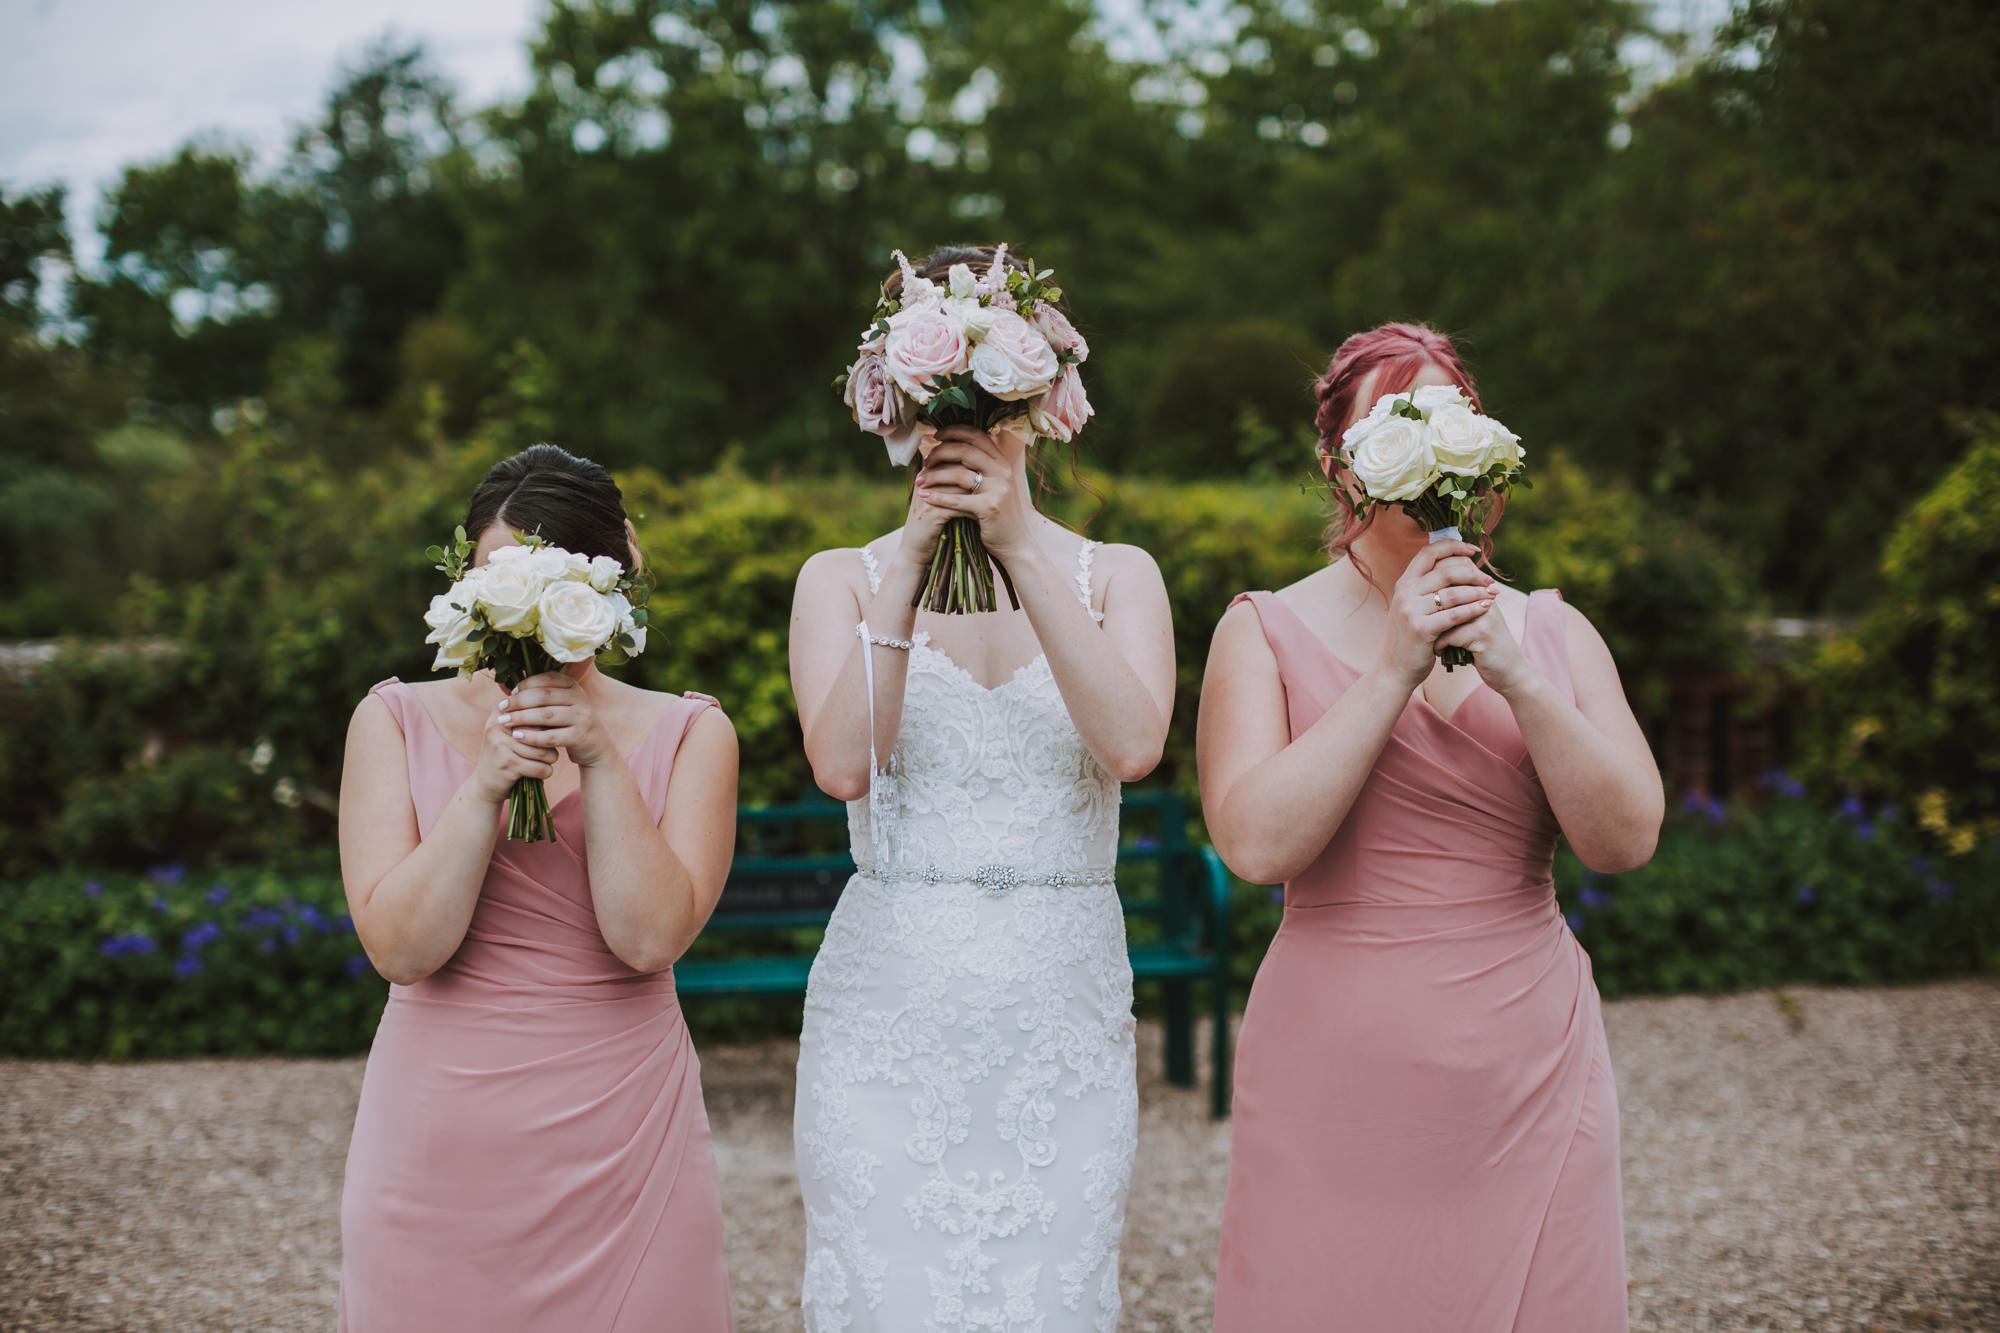 hodsock priory wedding photographers blog54.jpg